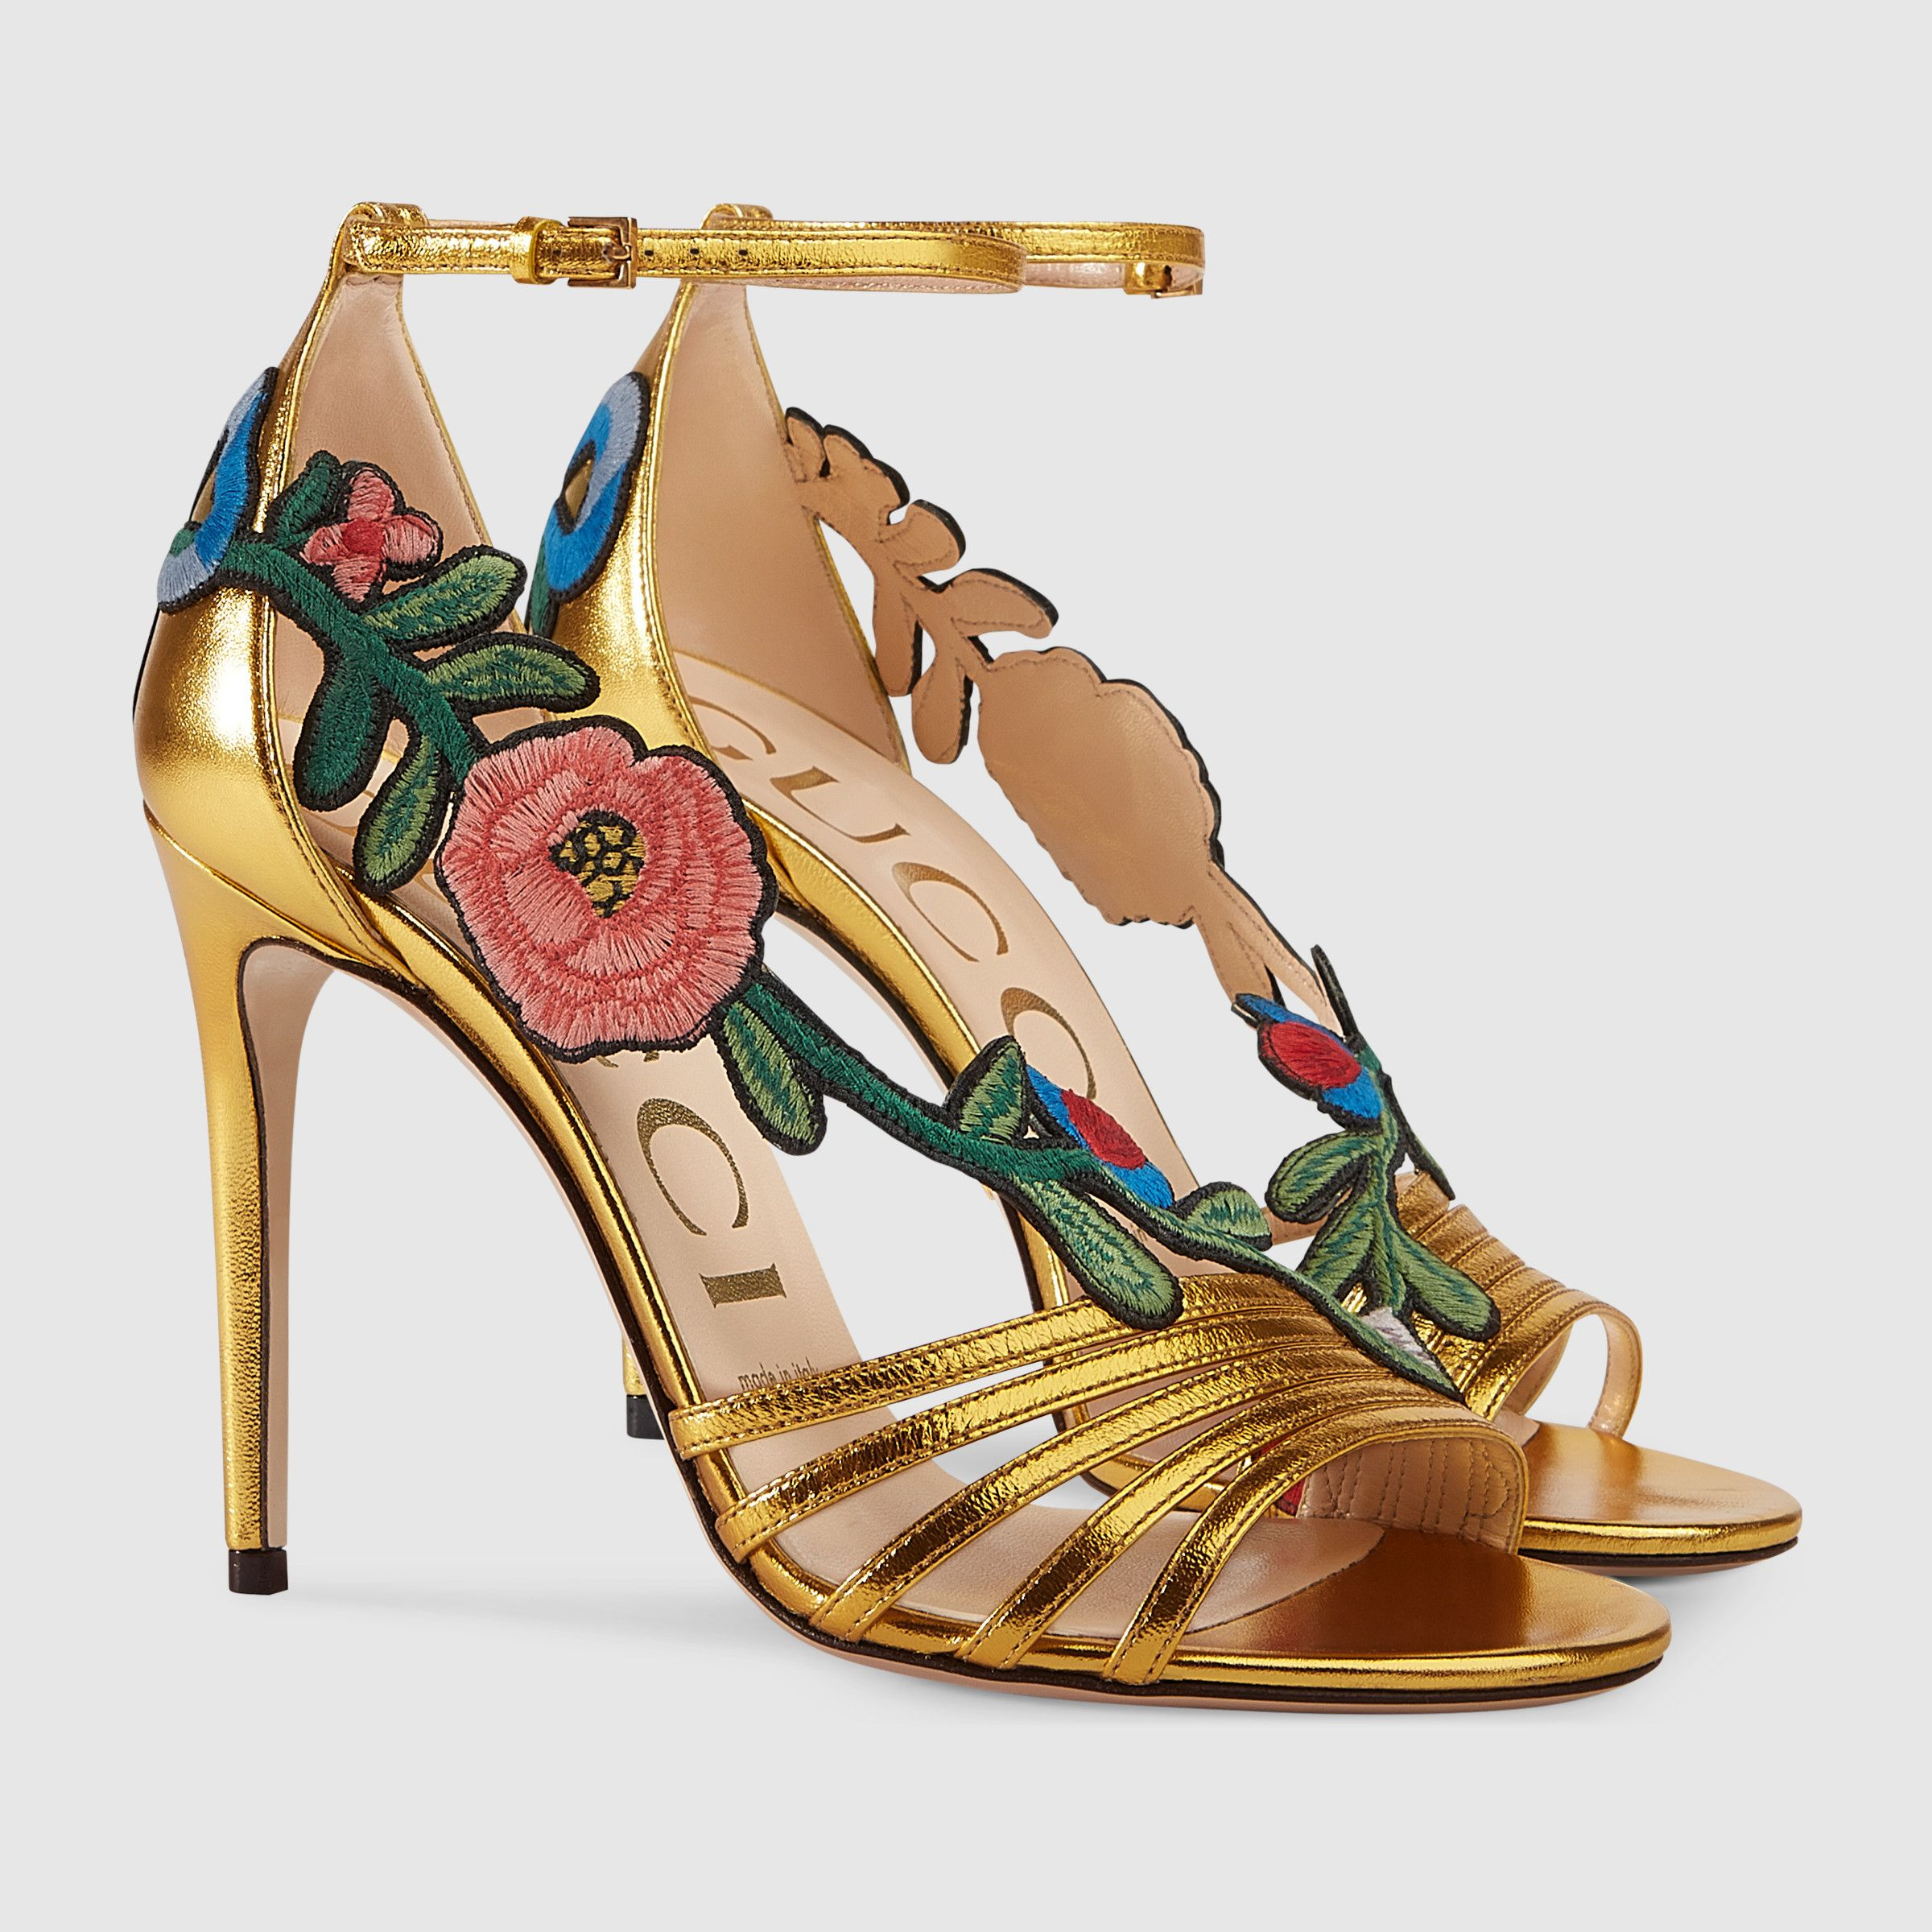 Sandalia de Piel Gucci rZTy7r